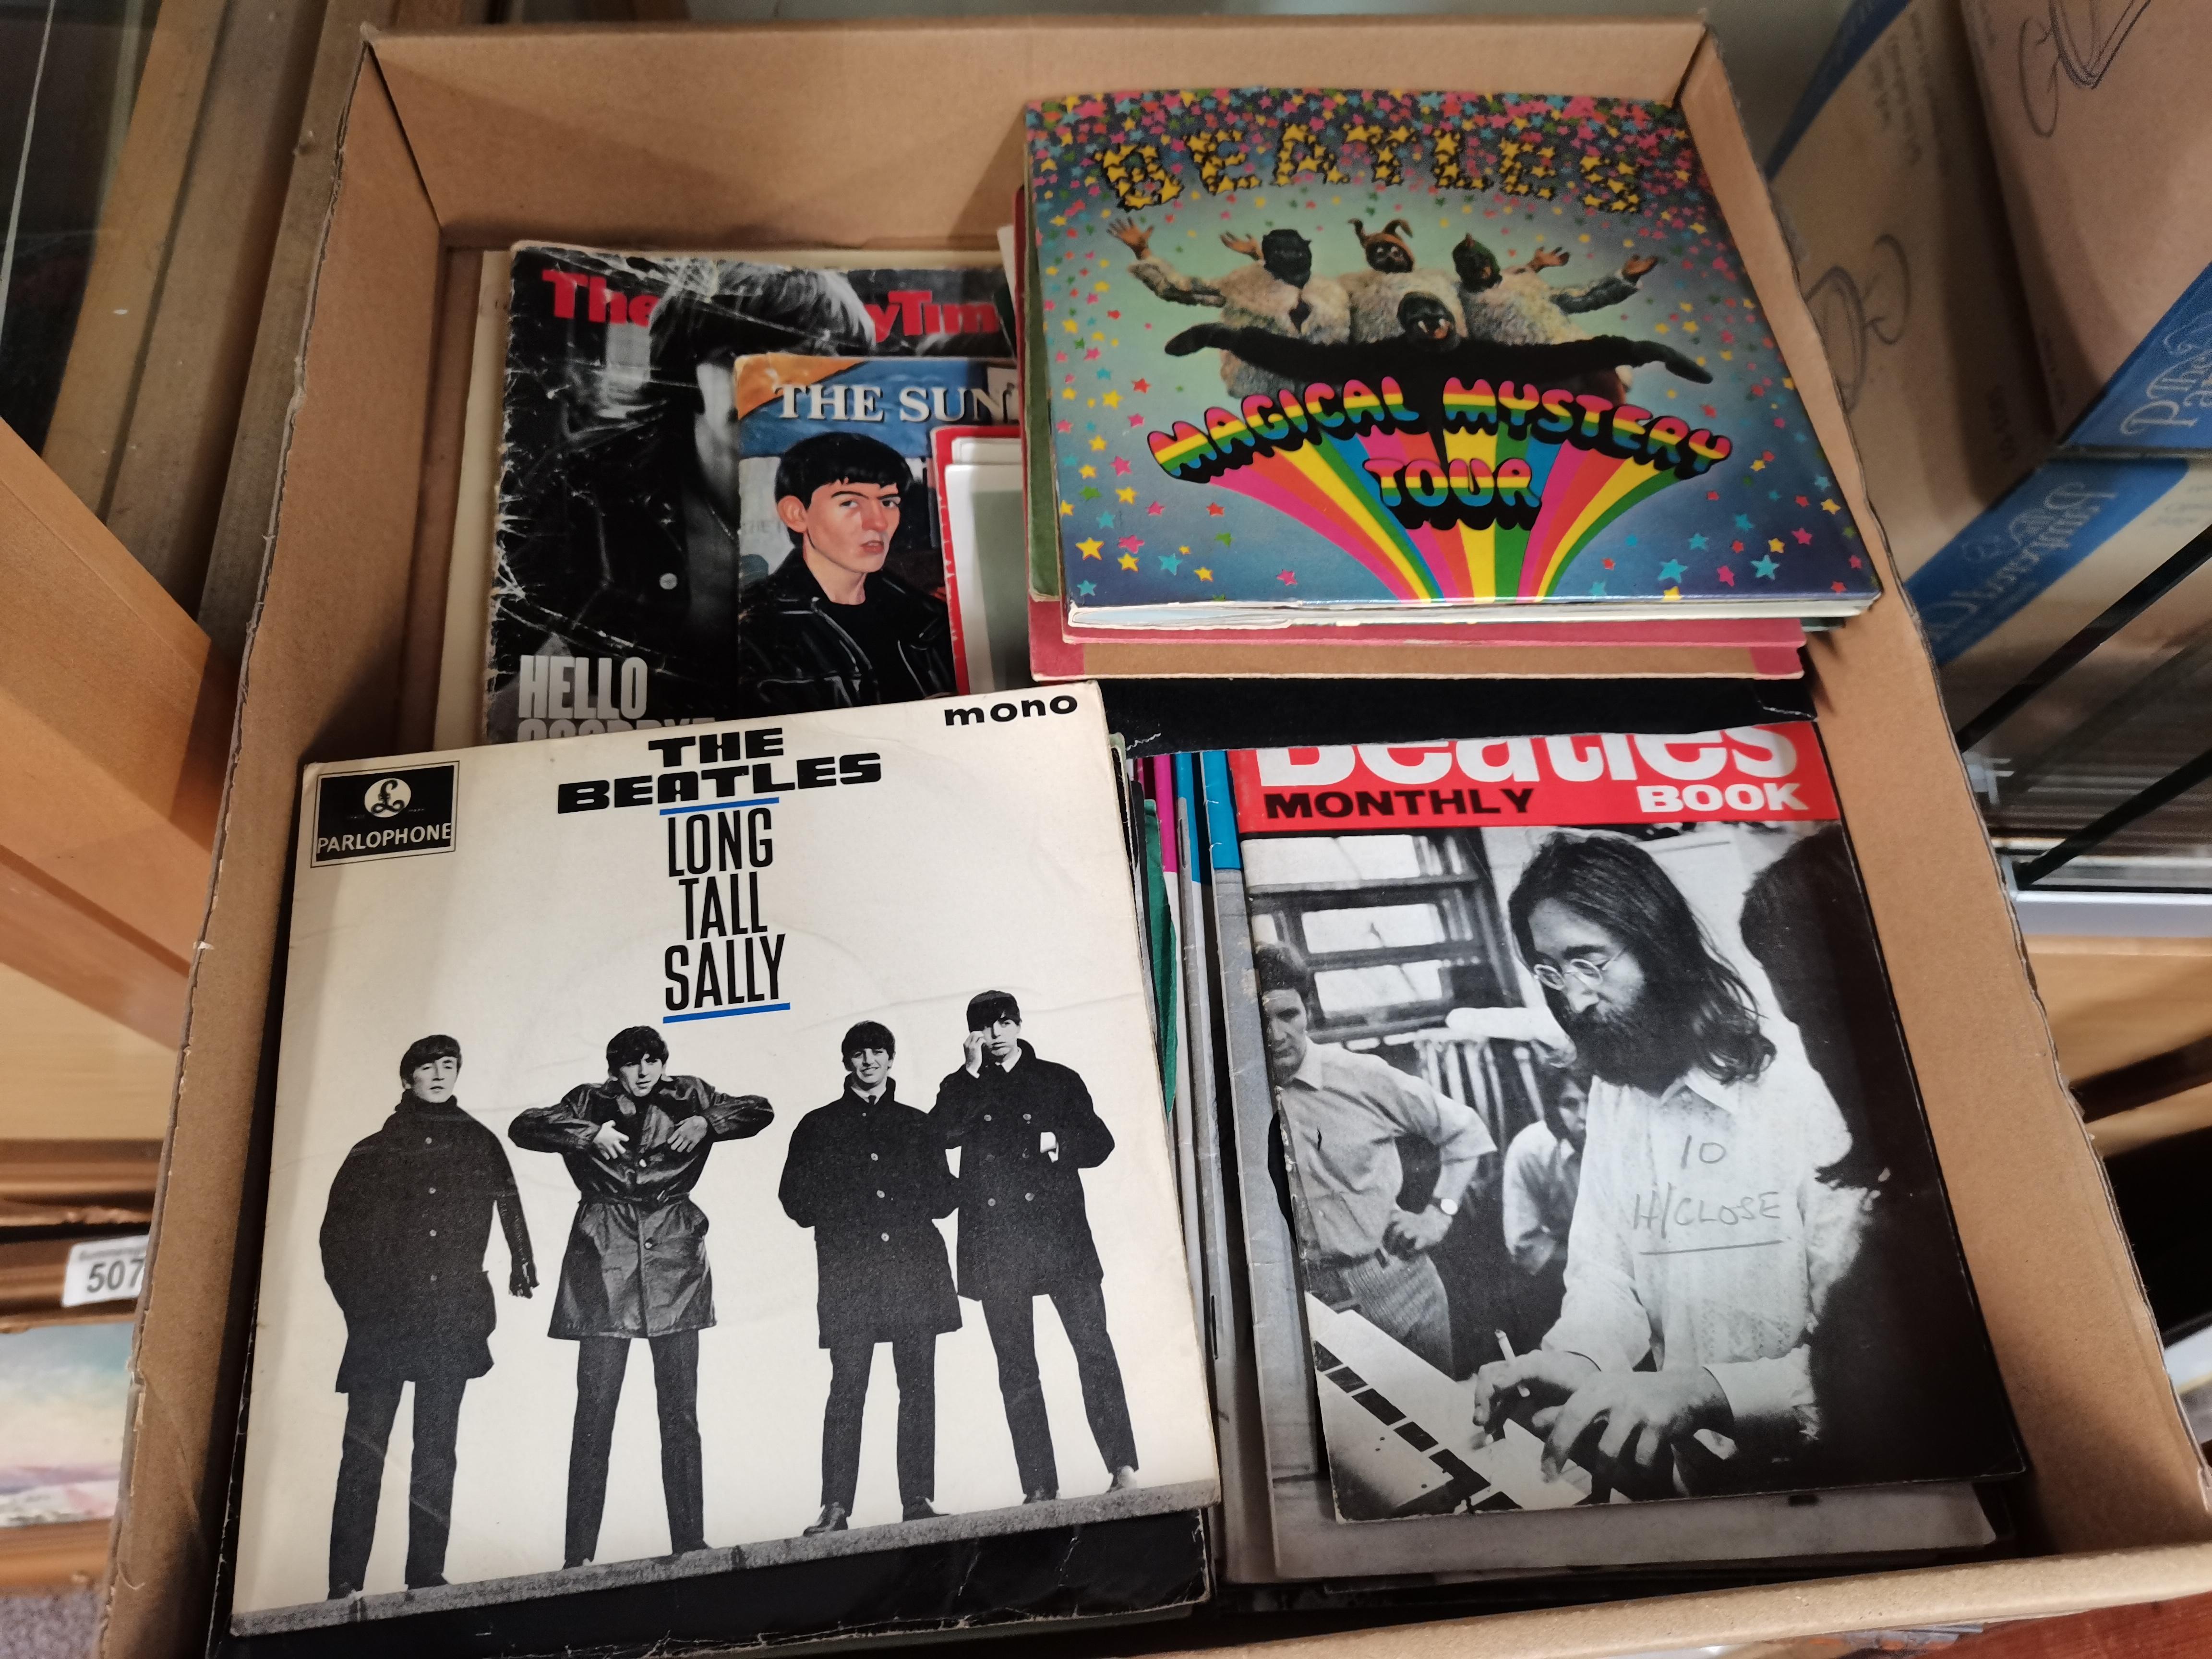 Beatles records etc - Image 3 of 3